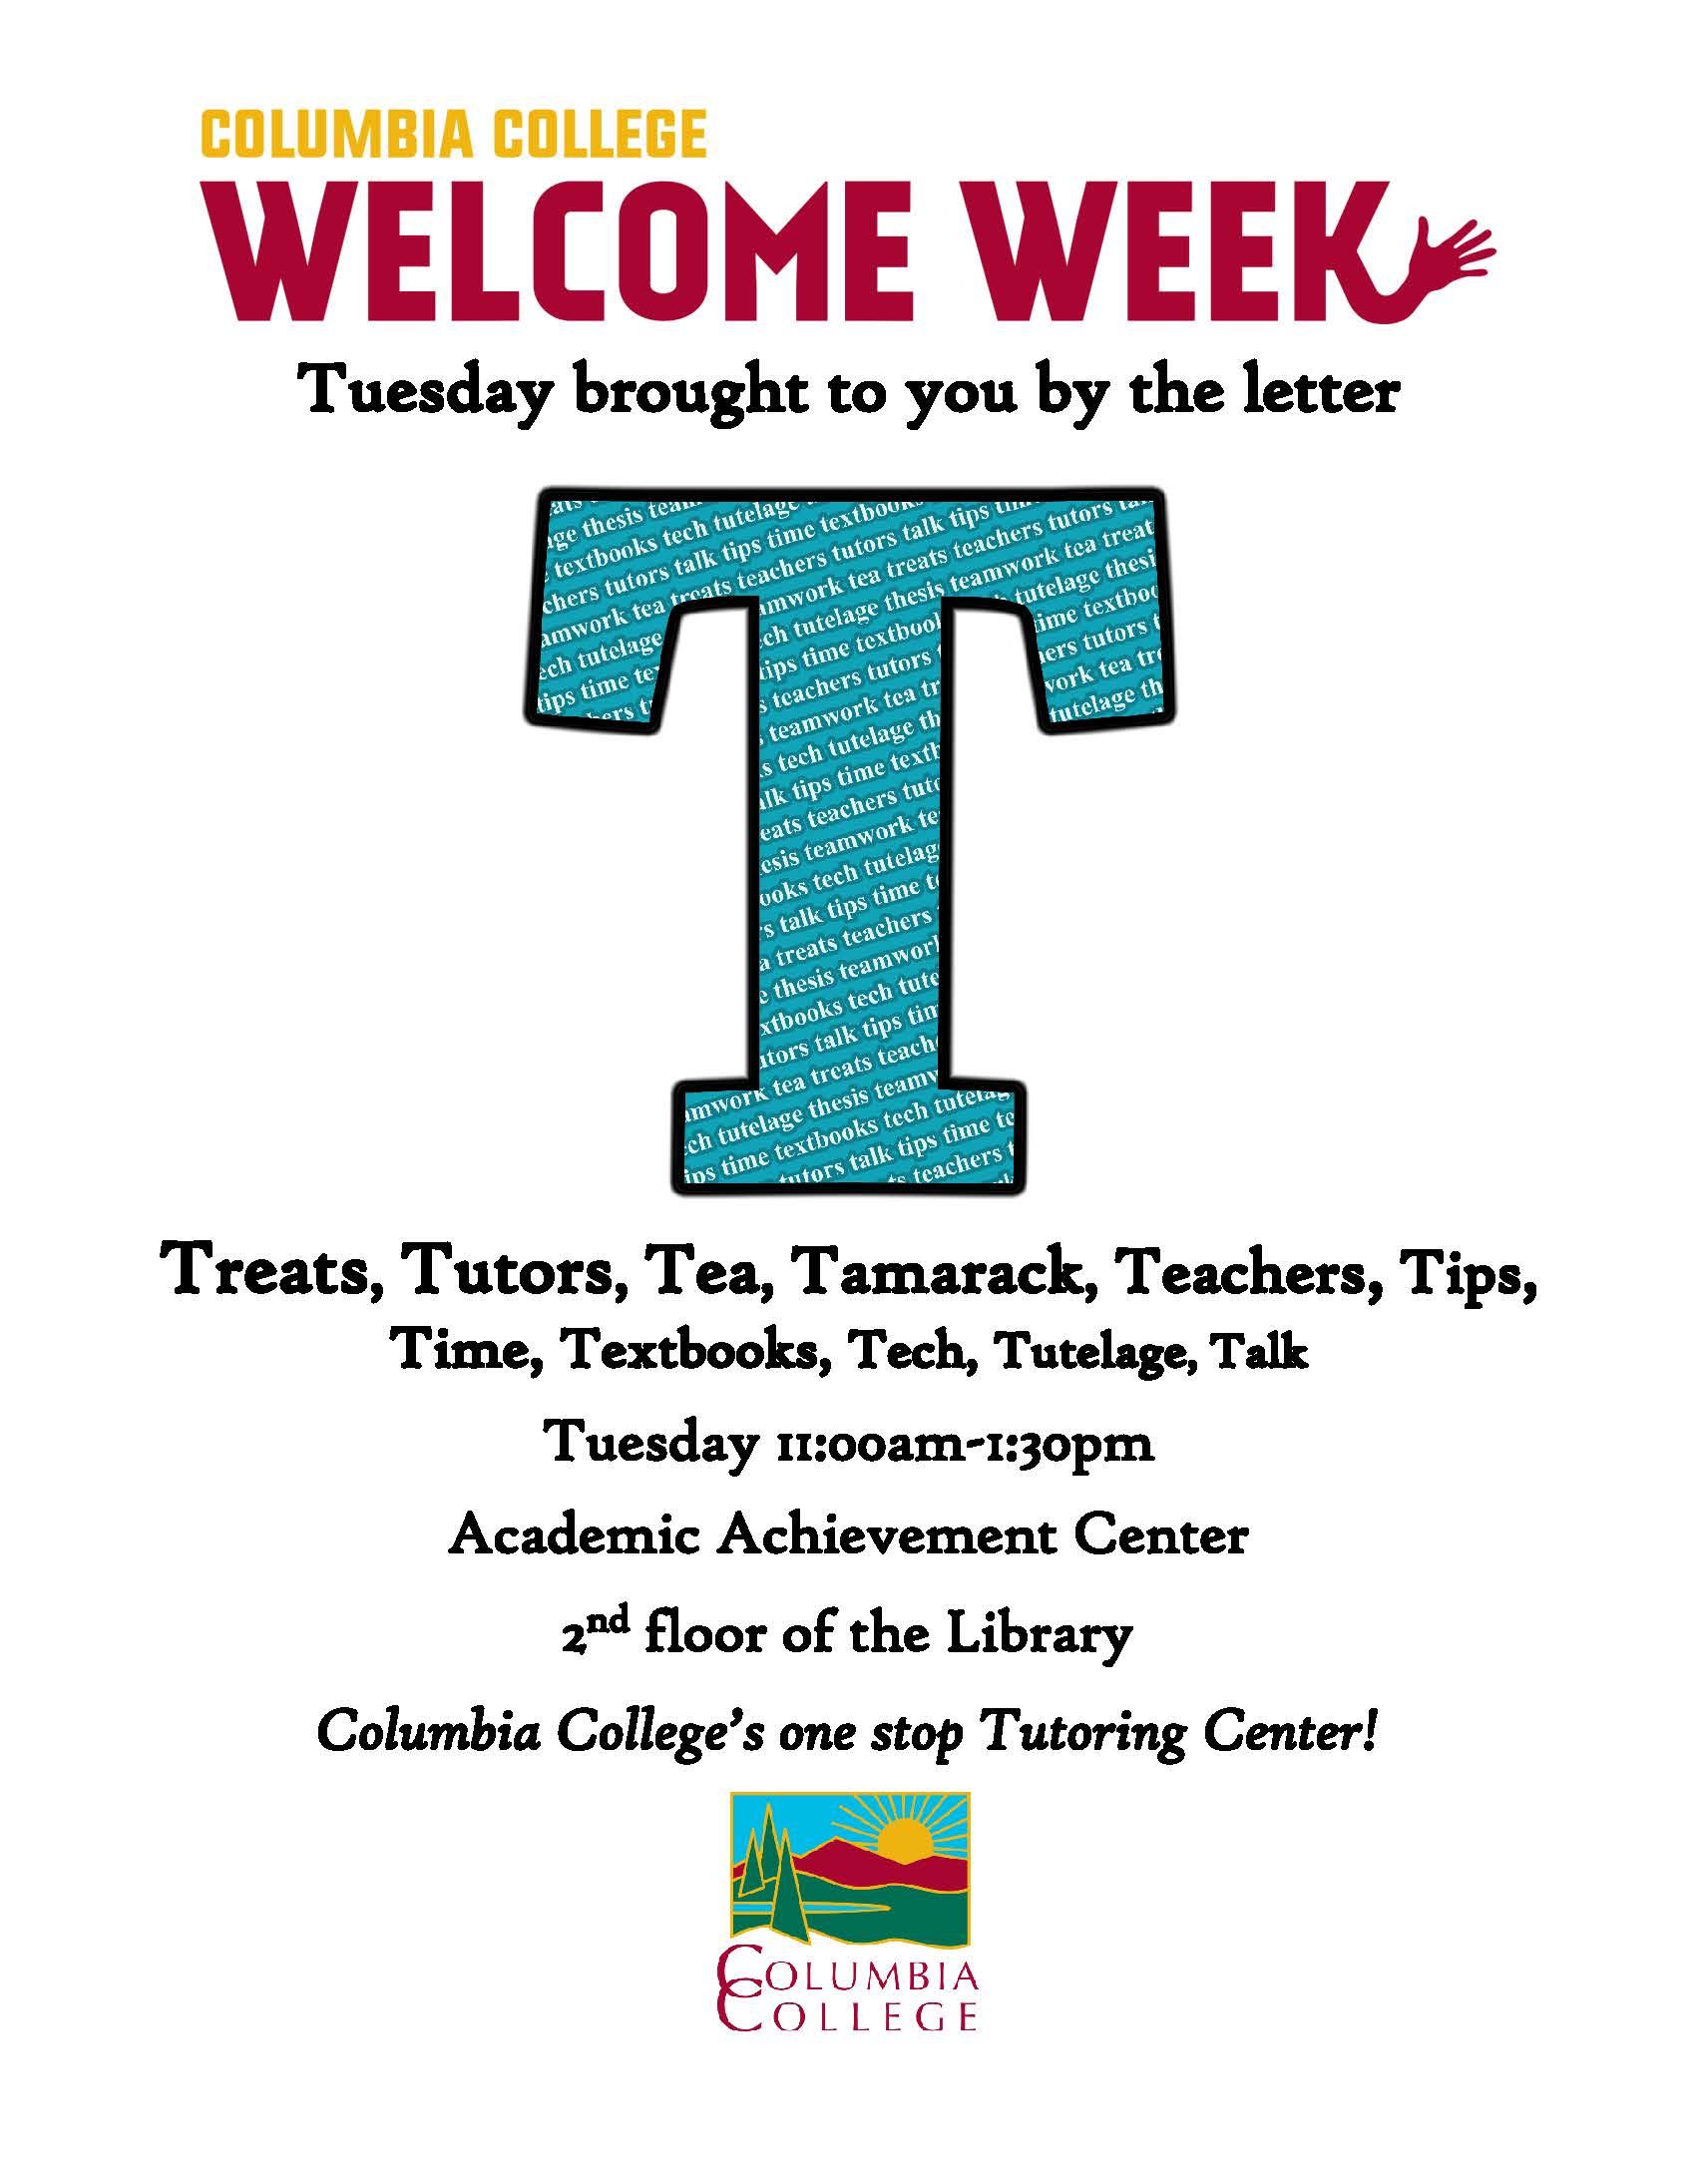 Tuesday Welcome Week update